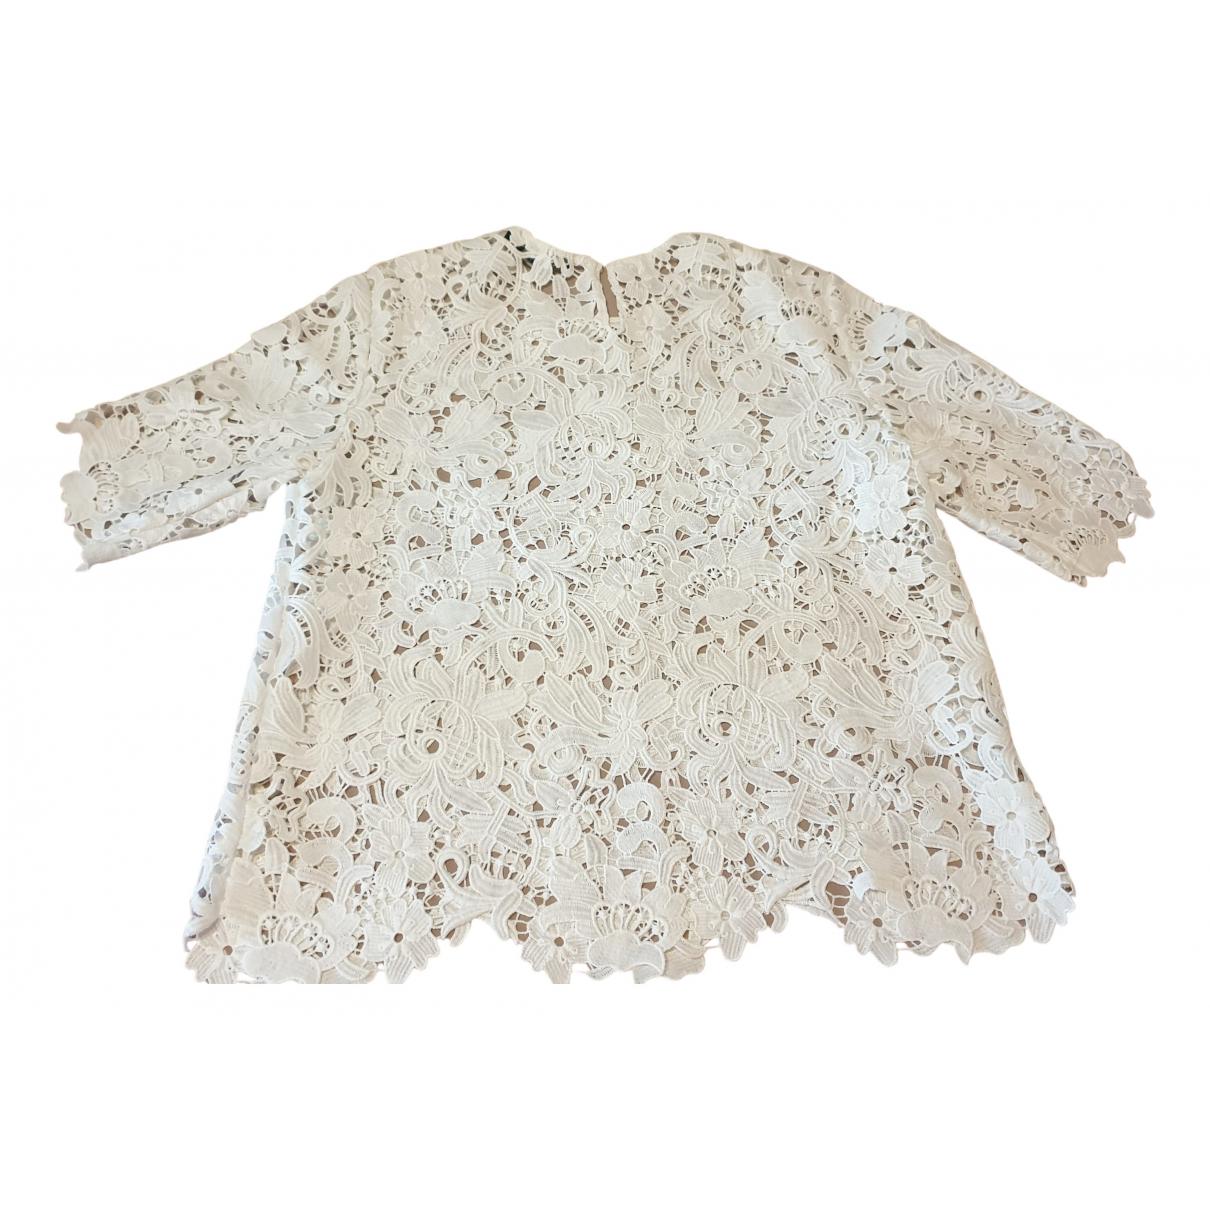 Zara - Top   pour femme en dentelle - blanc